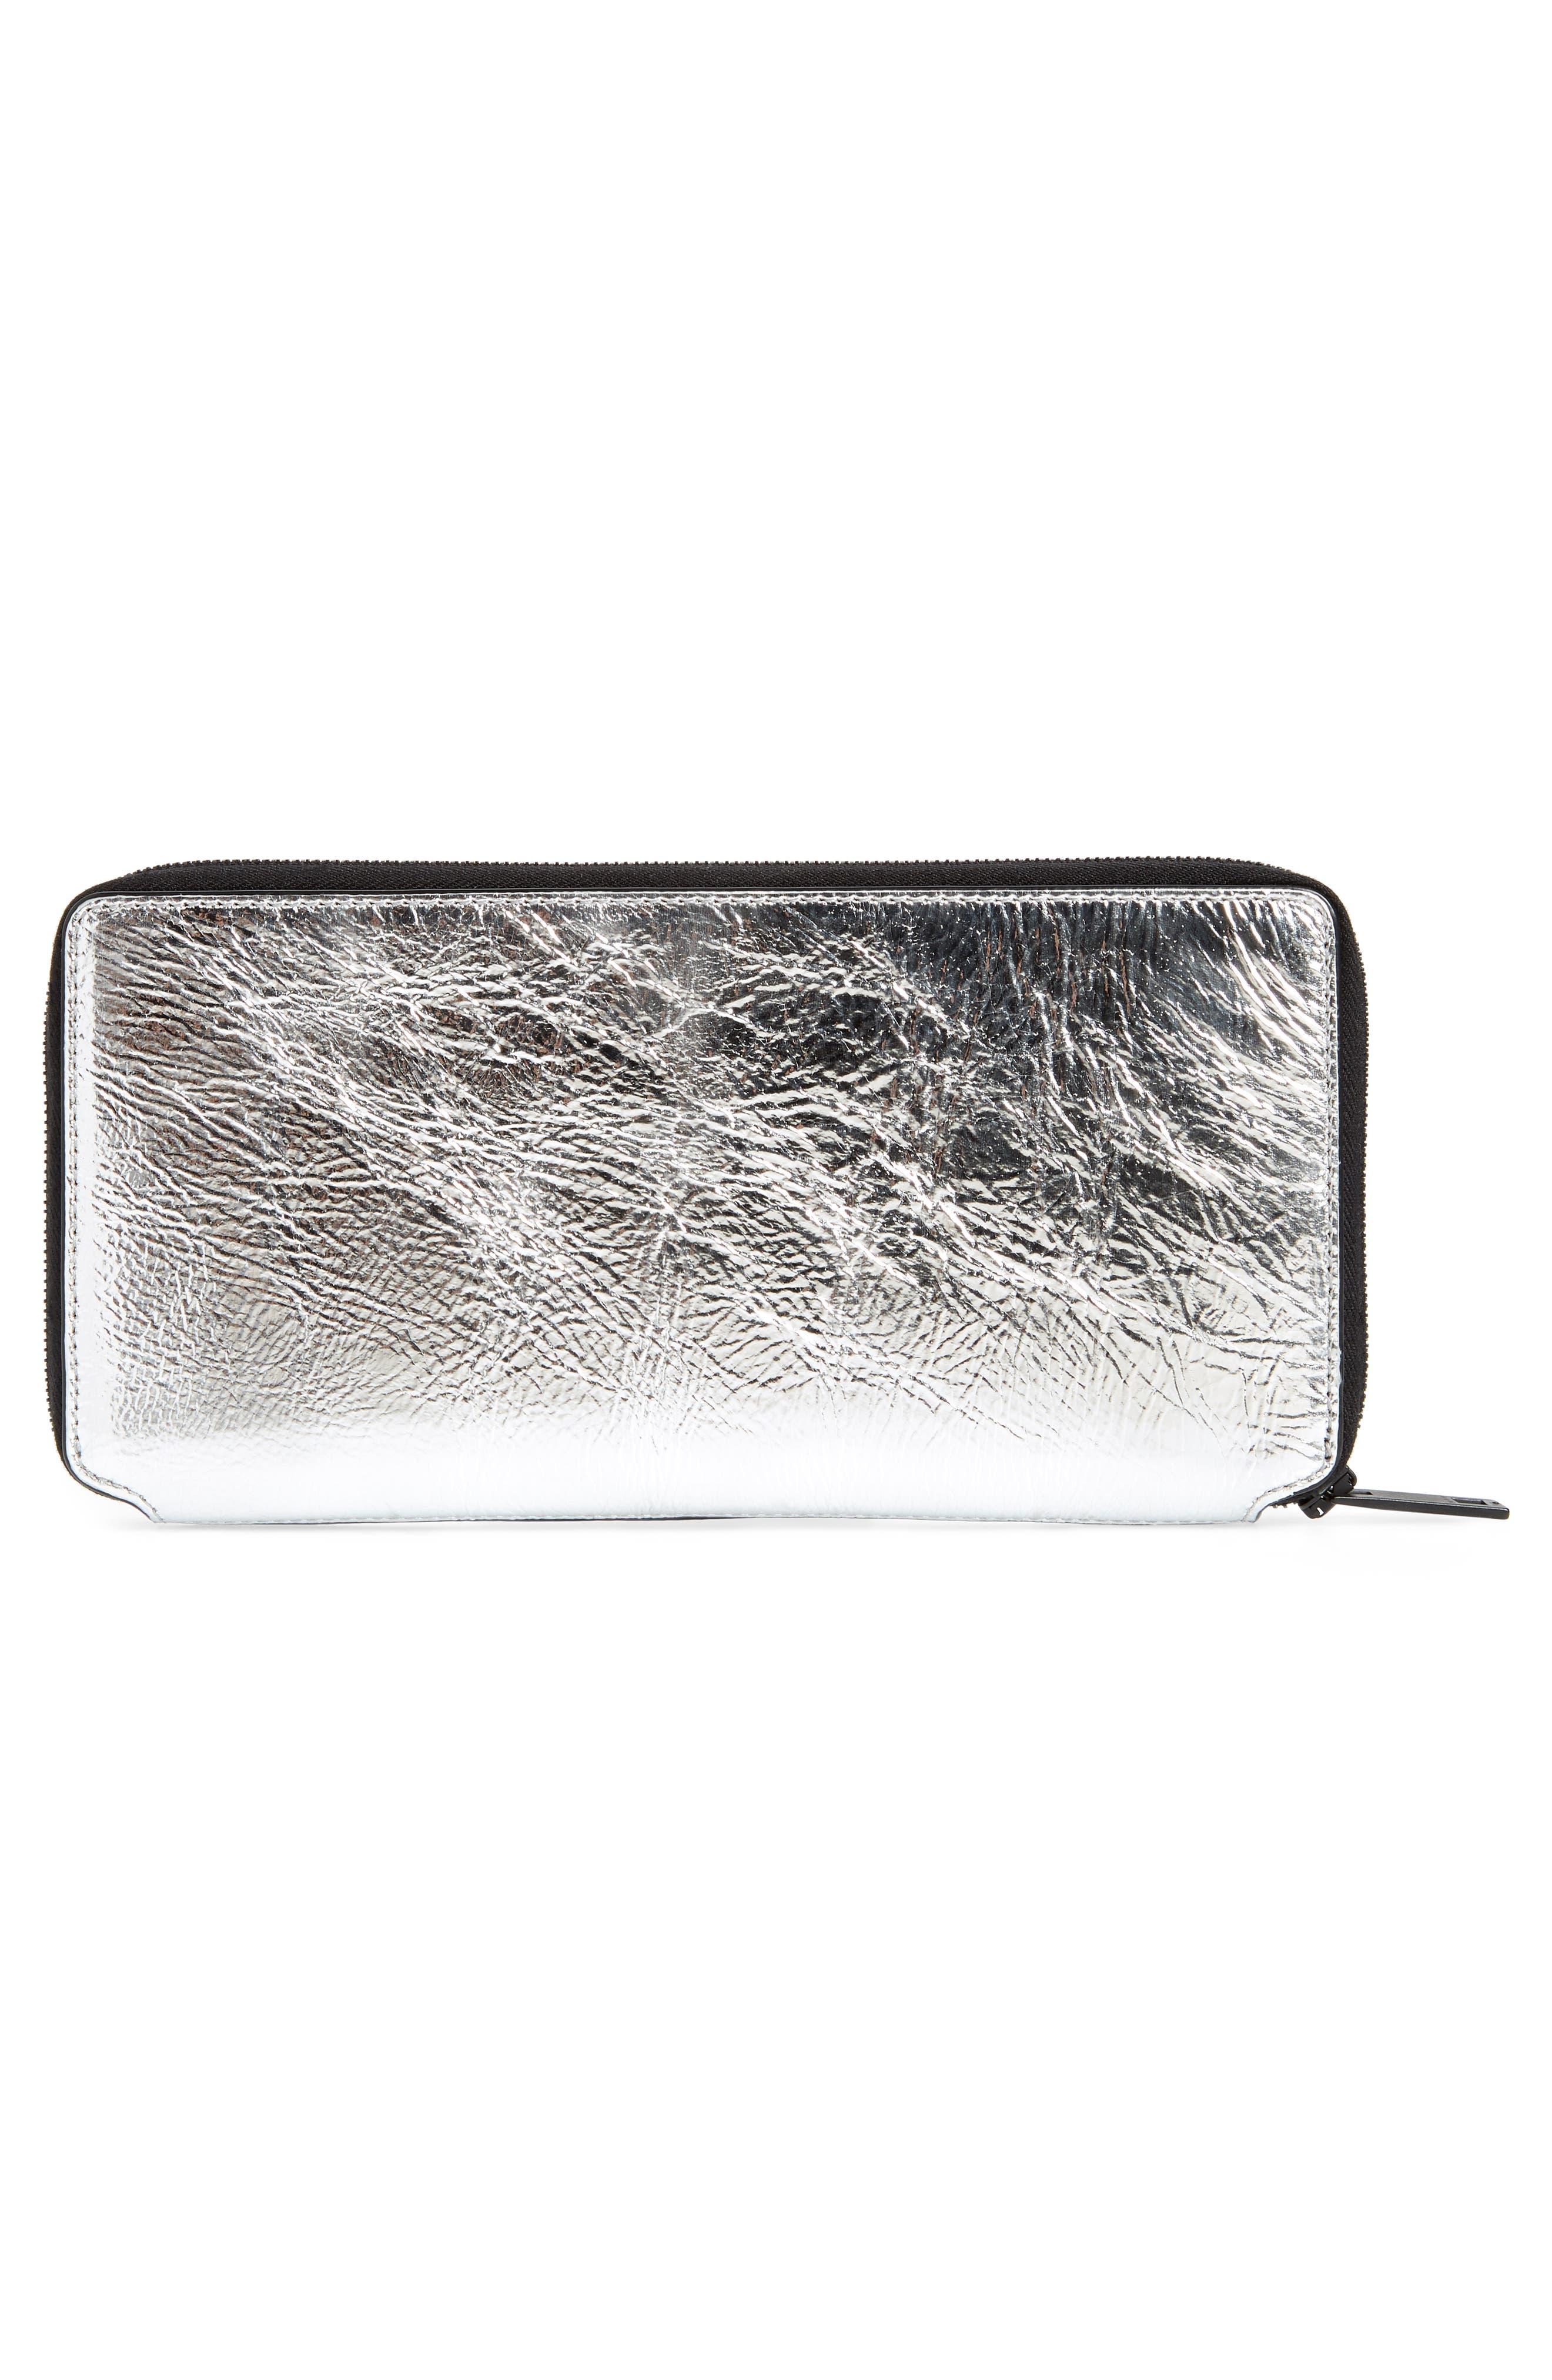 Croc Metallic Lambskin Leather Wallet,                             Alternate thumbnail 3, color,